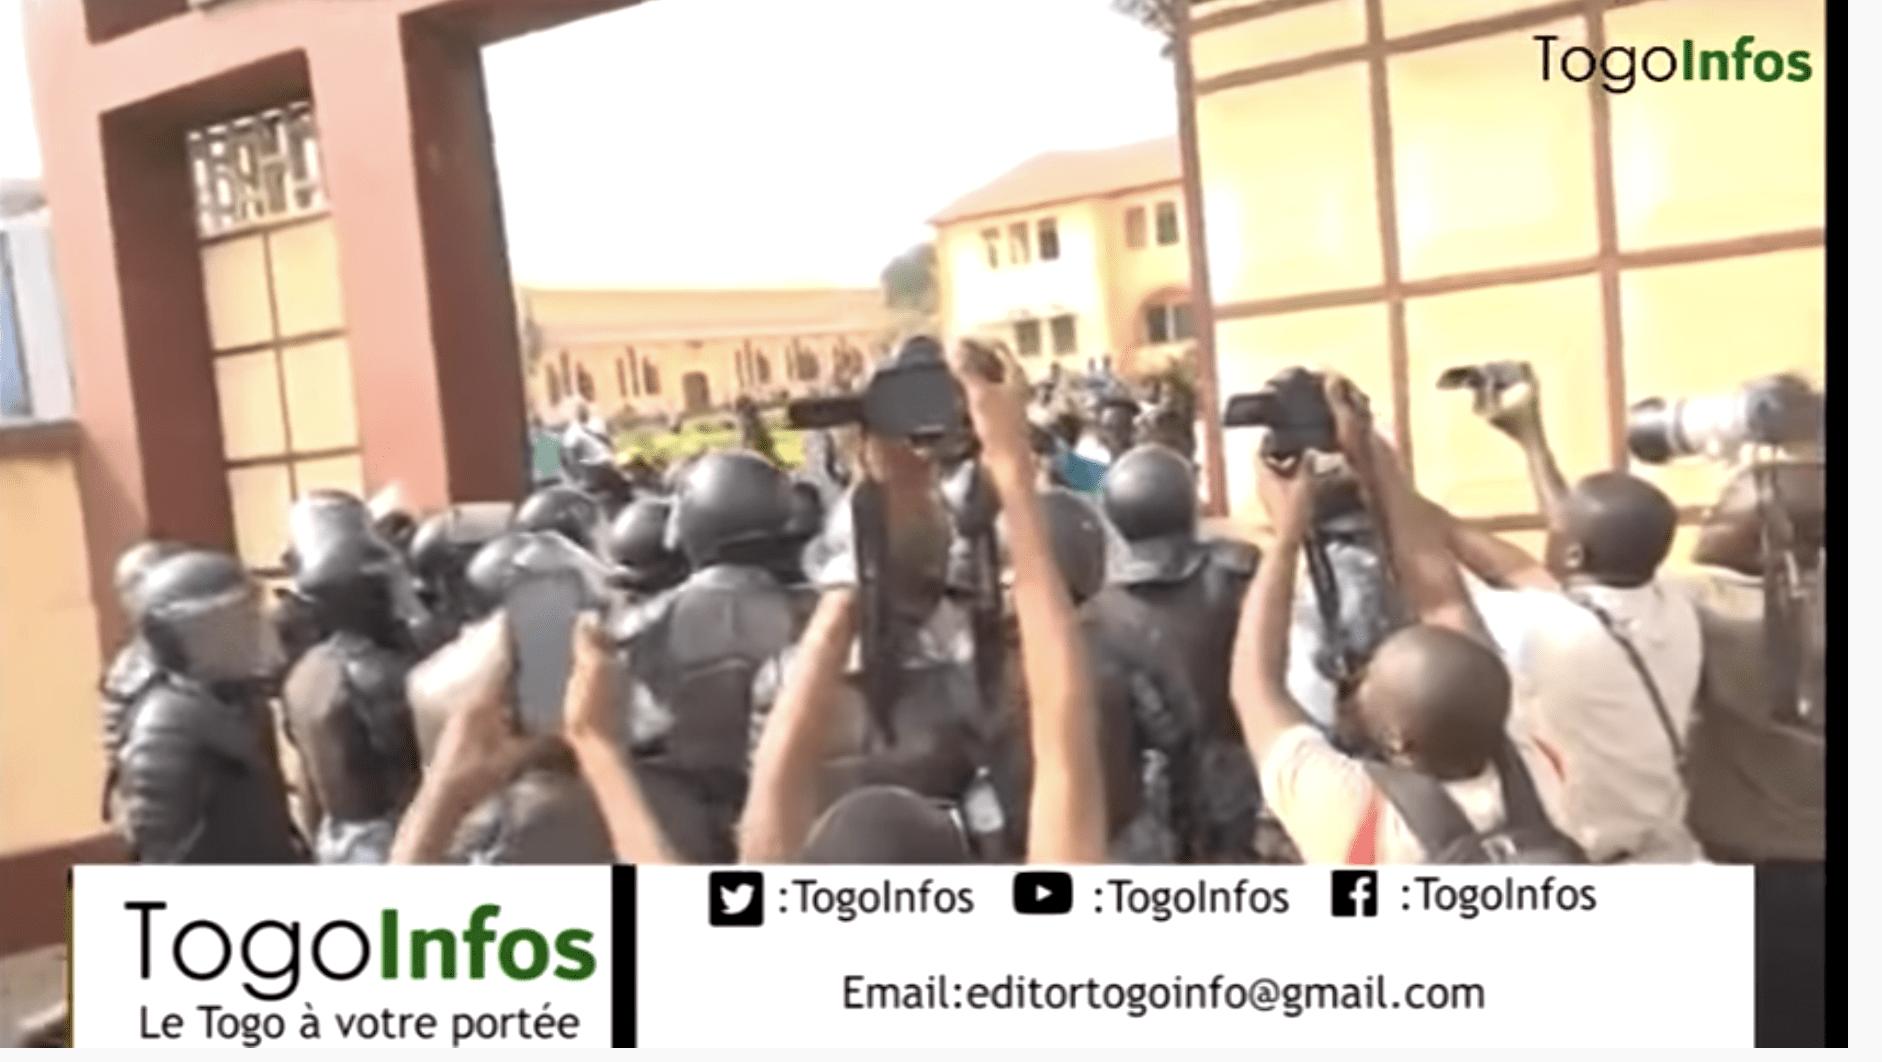 Togo: les temps forts de la manifestation de Mgr Philippe Kpodzro